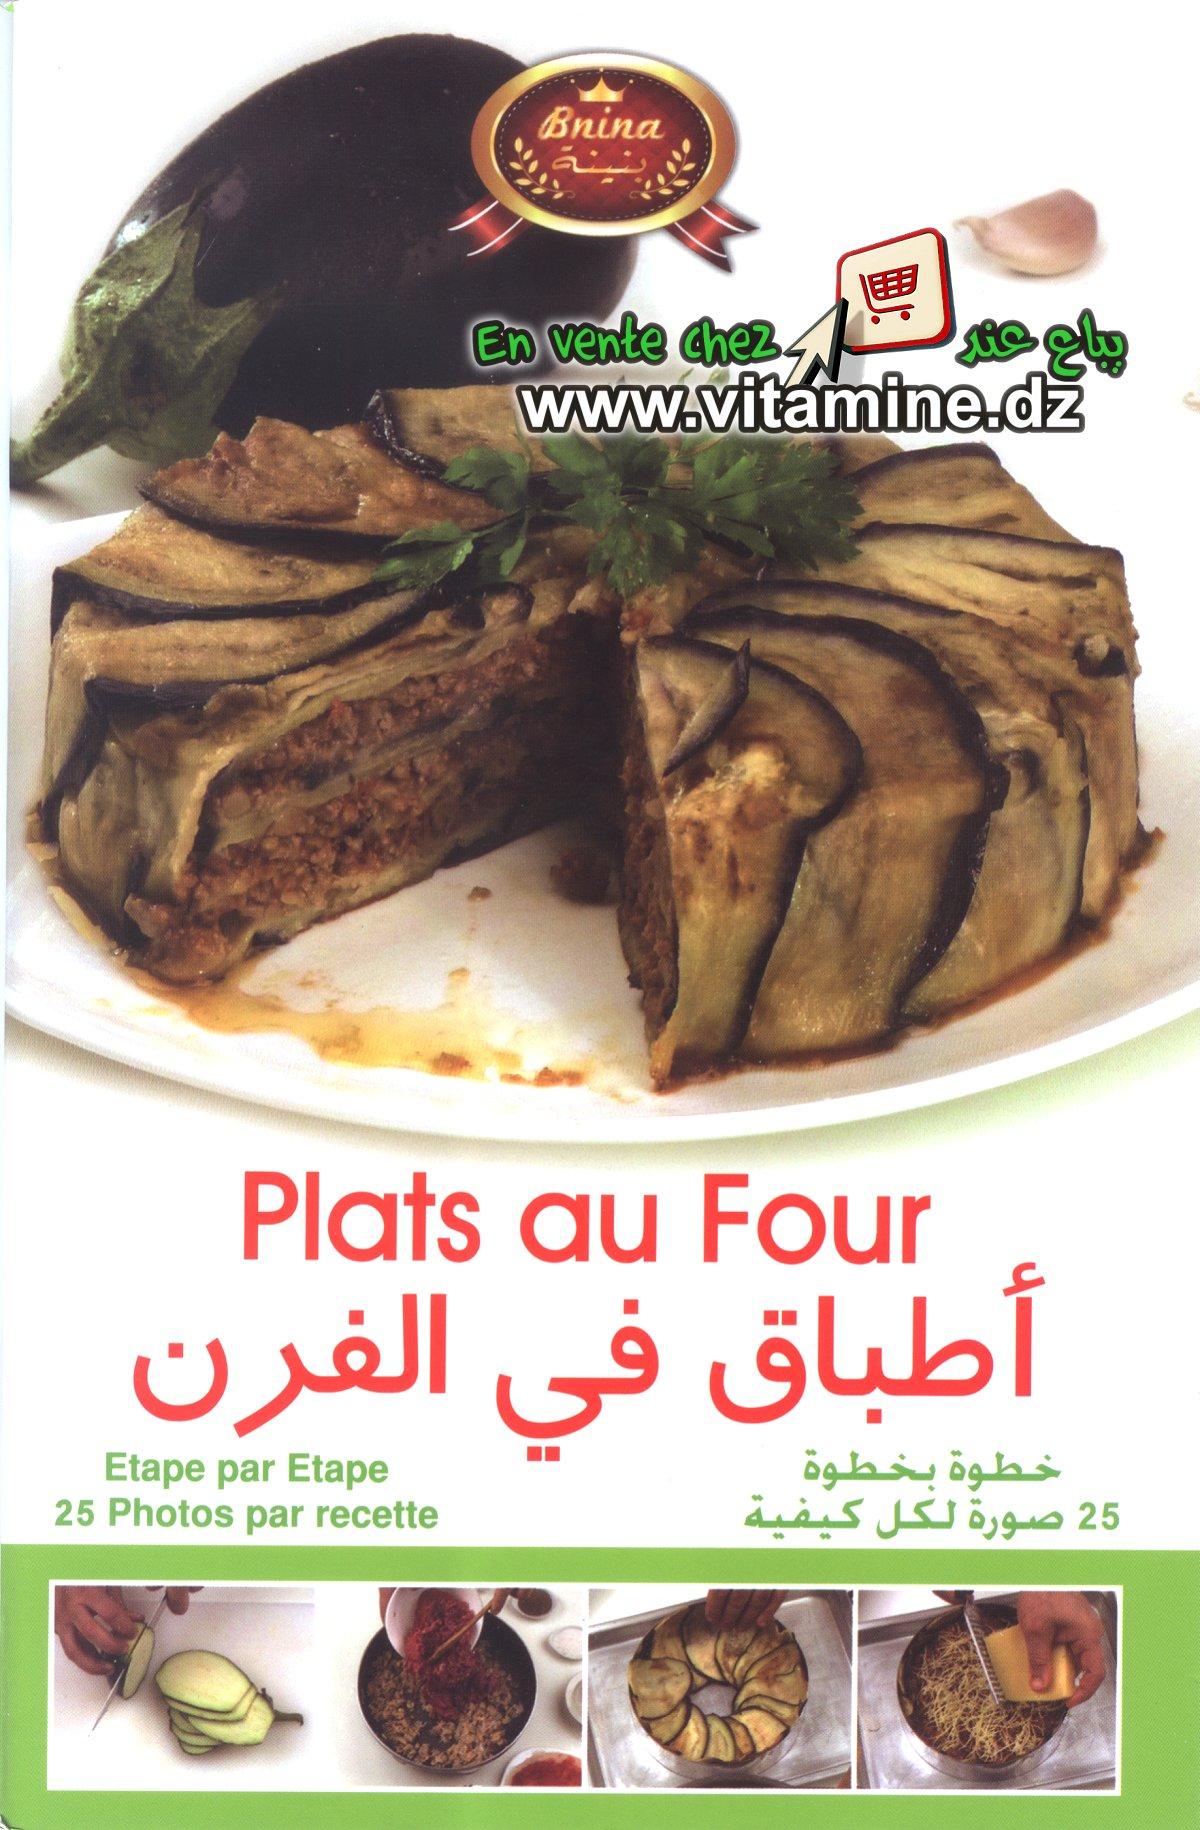 Bnina - Plats au four